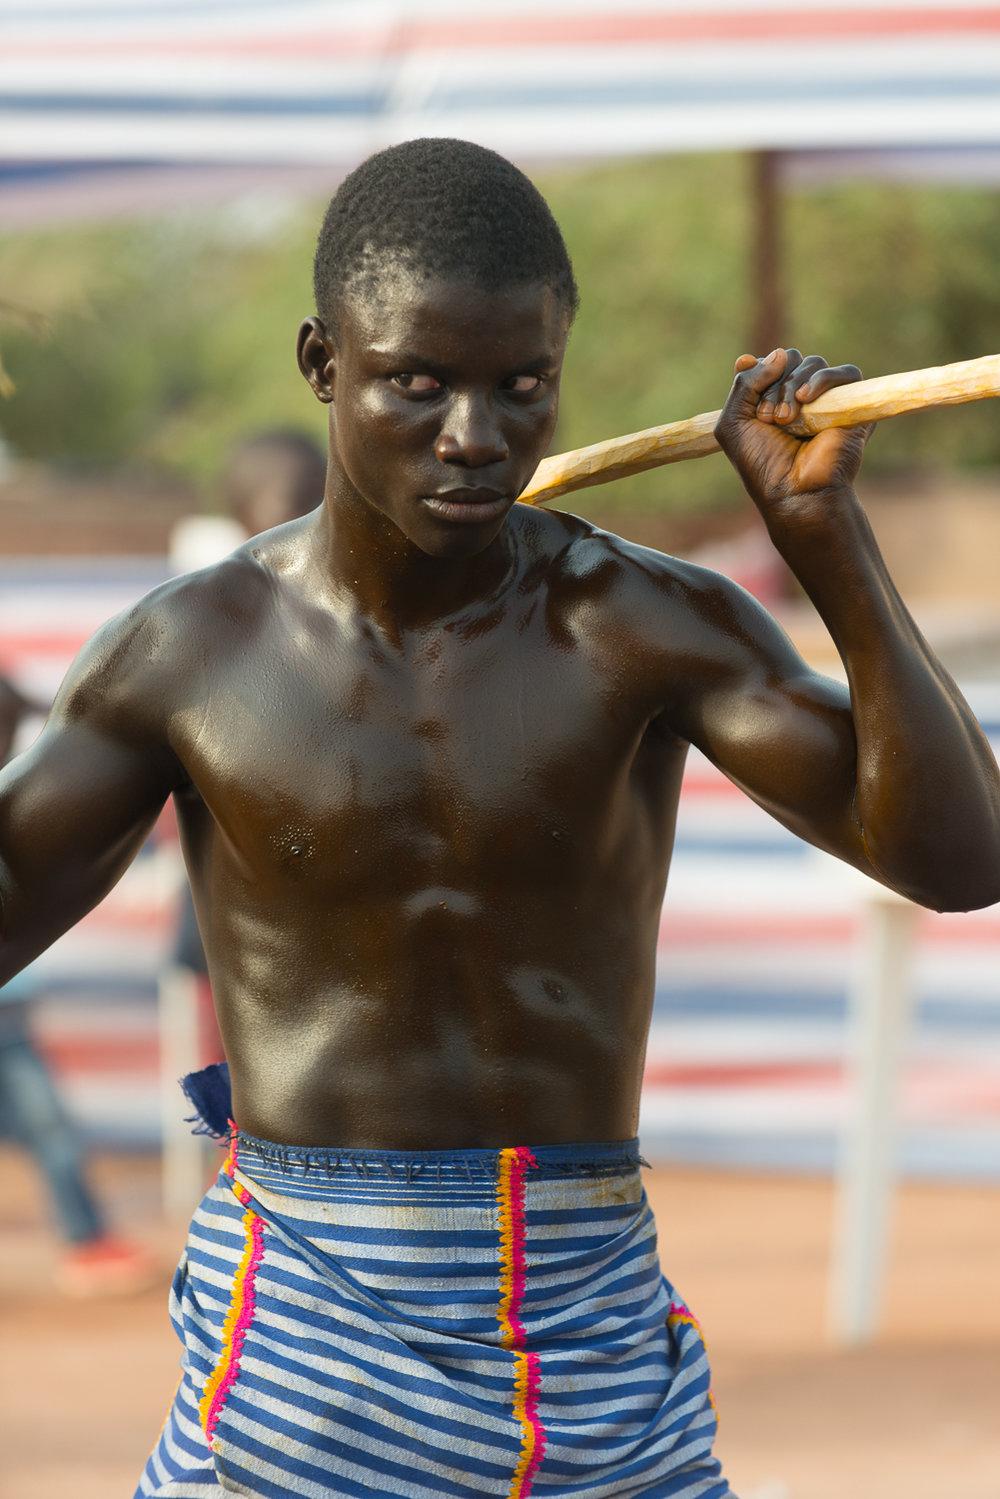 2018_02_Guinea-Bissau_Carnaval_Antula_PolonGrandeMadina_0028.jpg